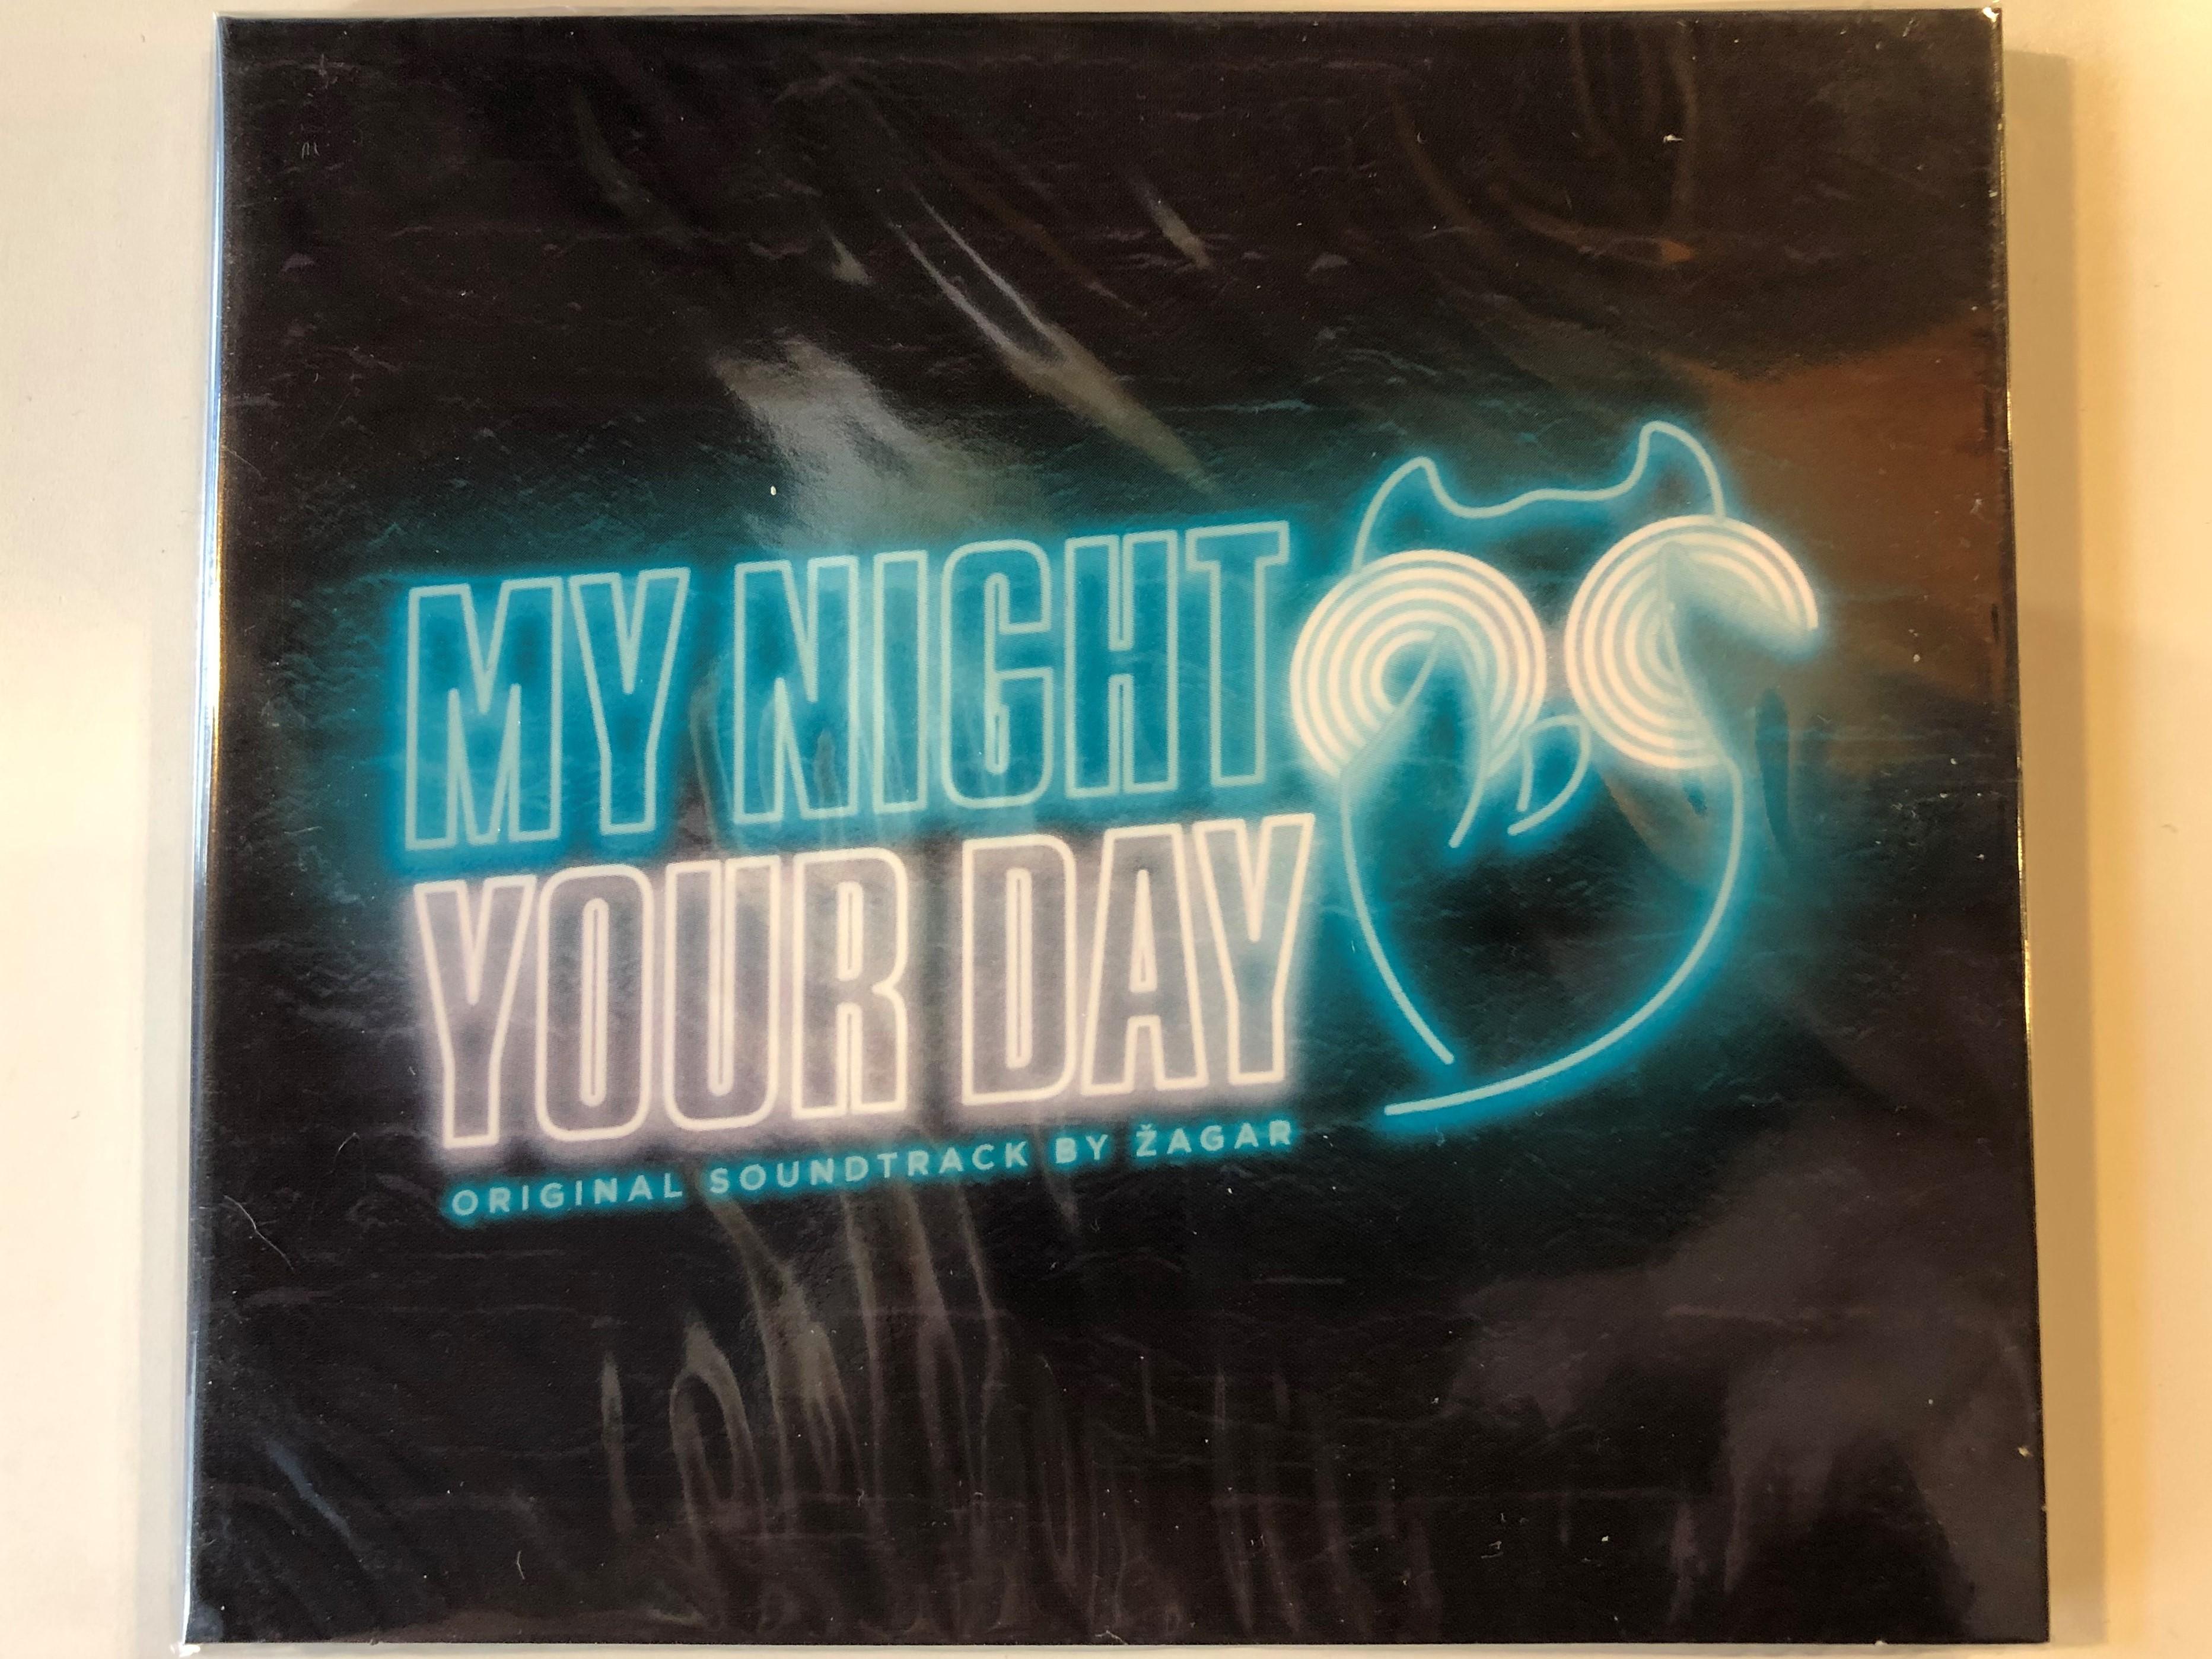 my-night-your-day-original-soundtrack-by-agar-zagarmusic-audio-cd-2015-5999543390721-1-.jpg